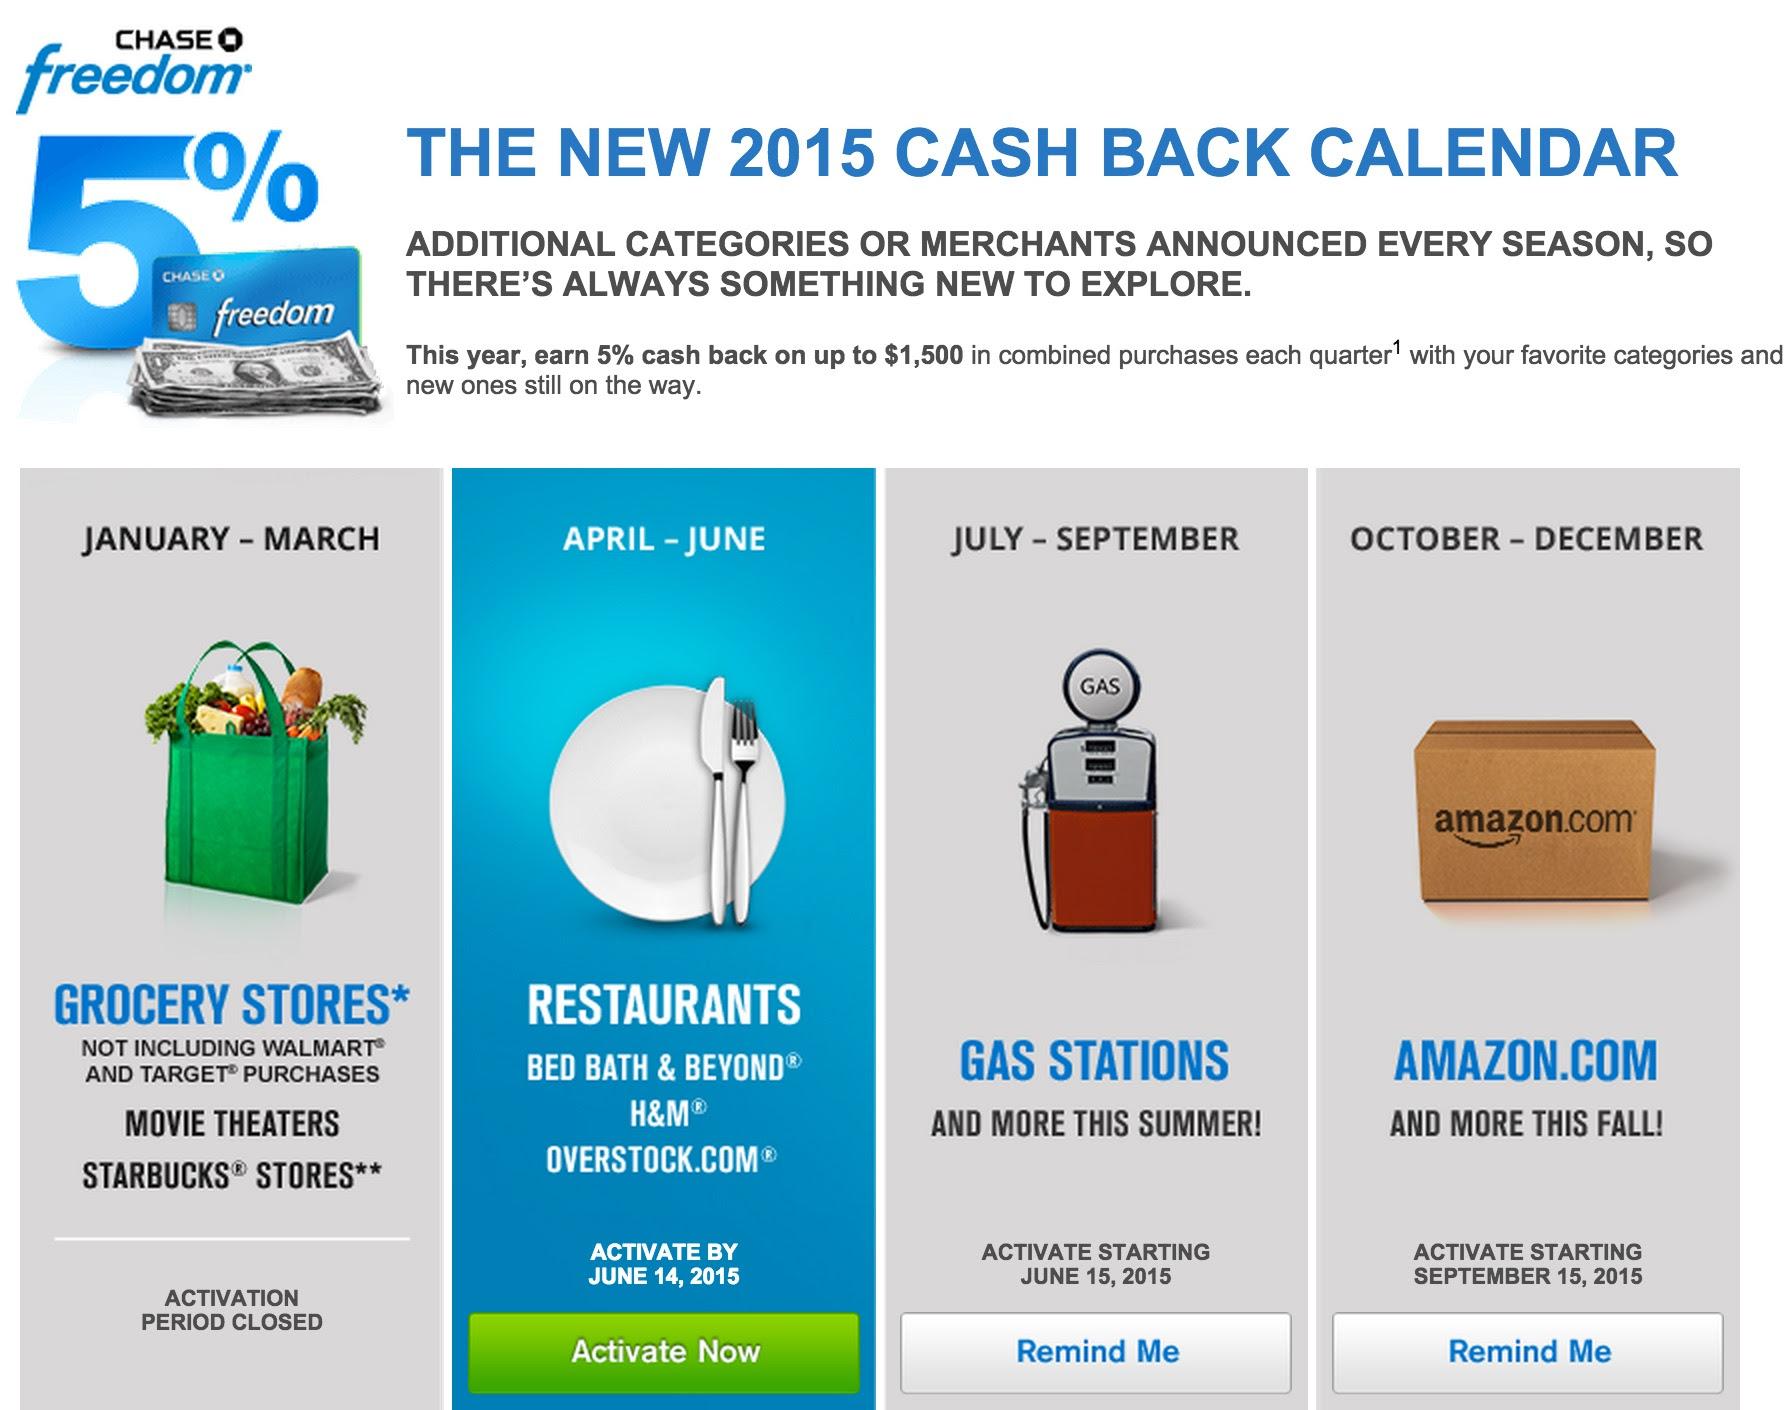 How to Use the Chase Freedom Calendar - SavingAdvice.com Blog